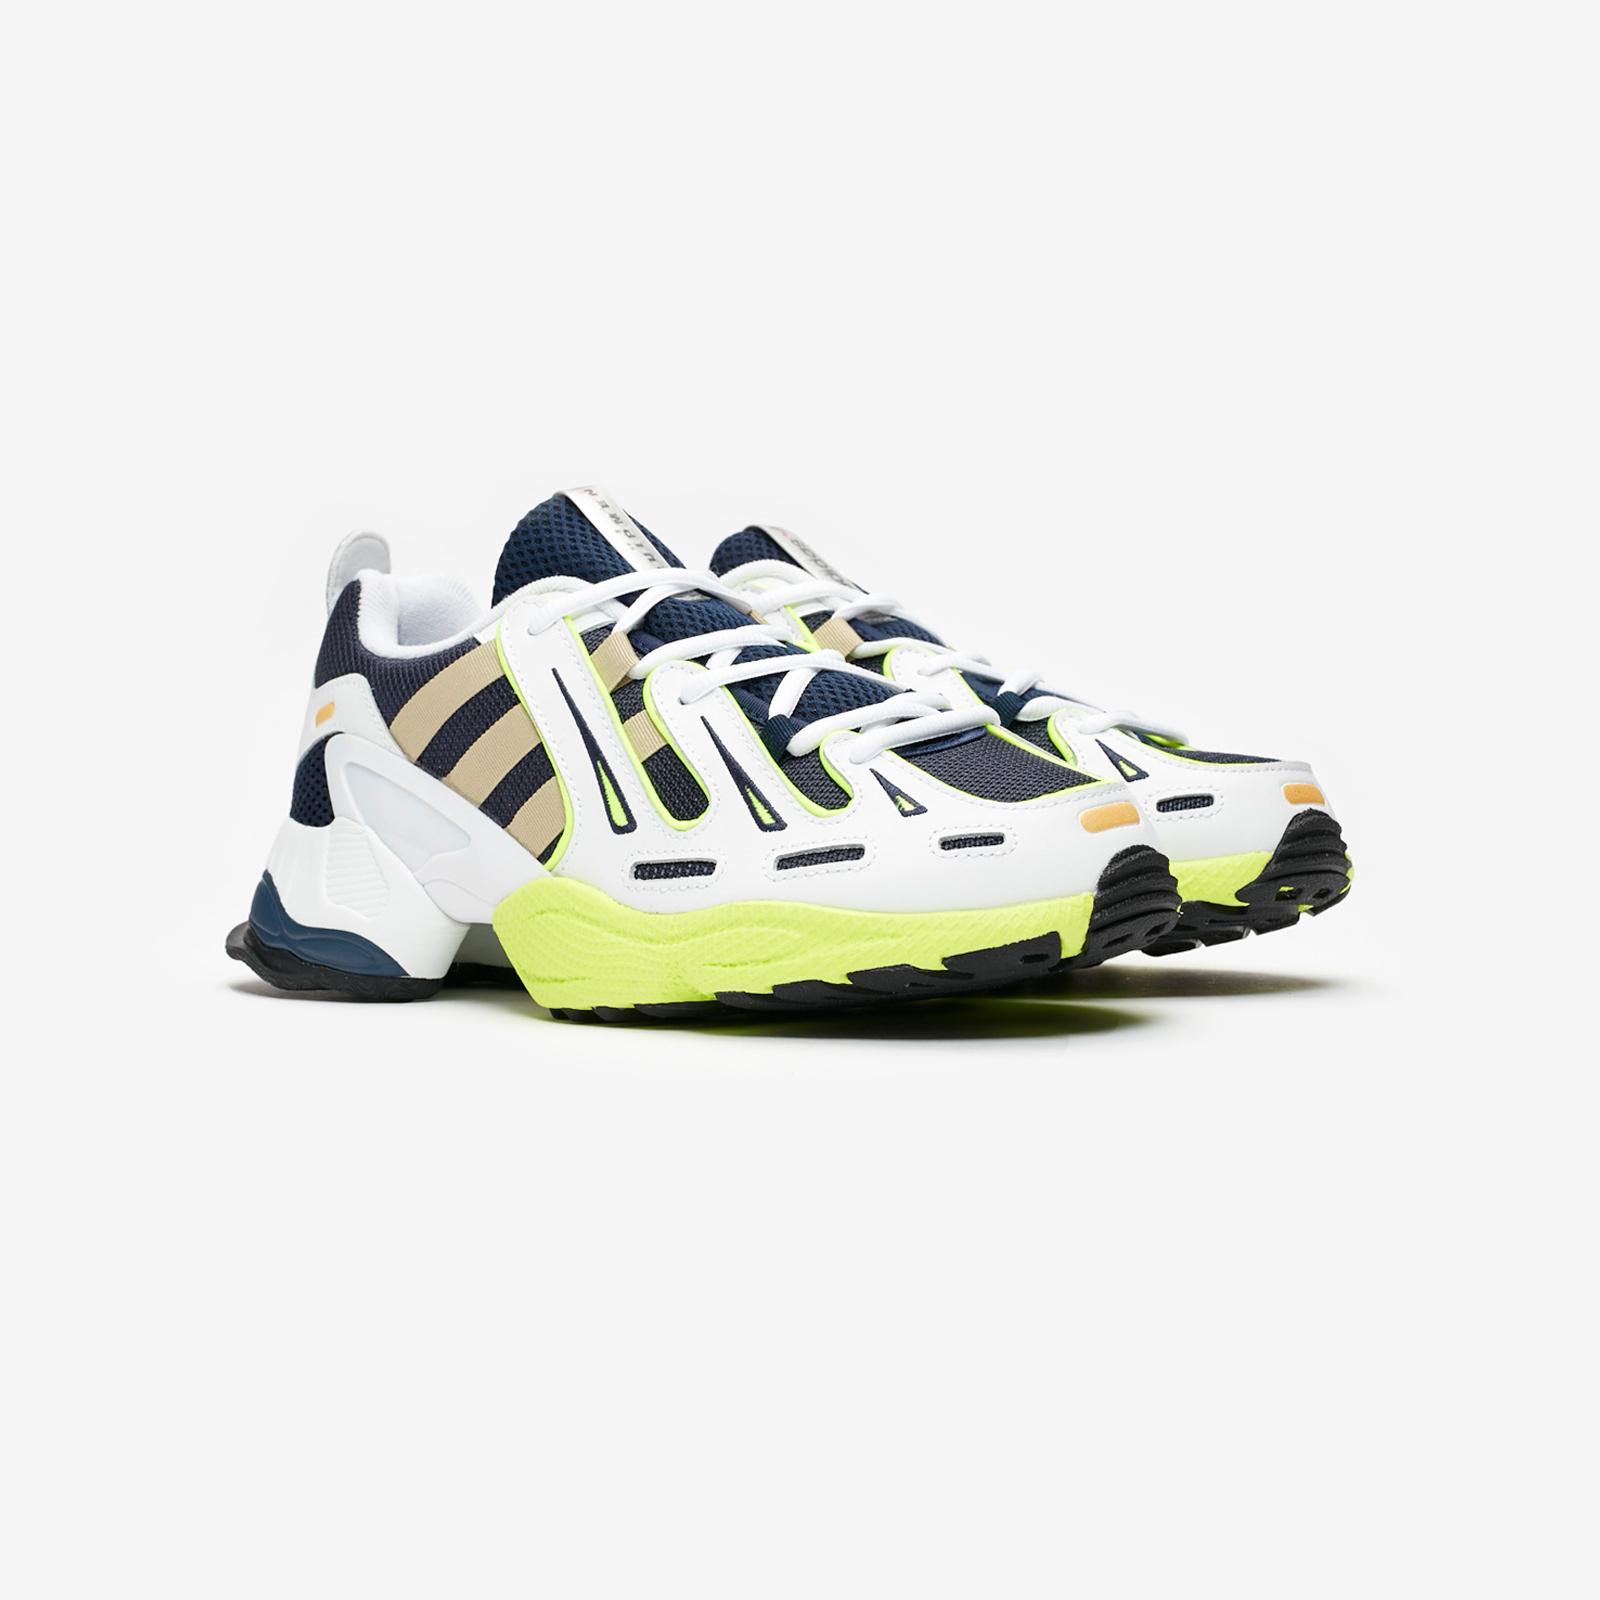 adidas EQT Gazelle Ee7742 Sneakersnstuff | sneakers